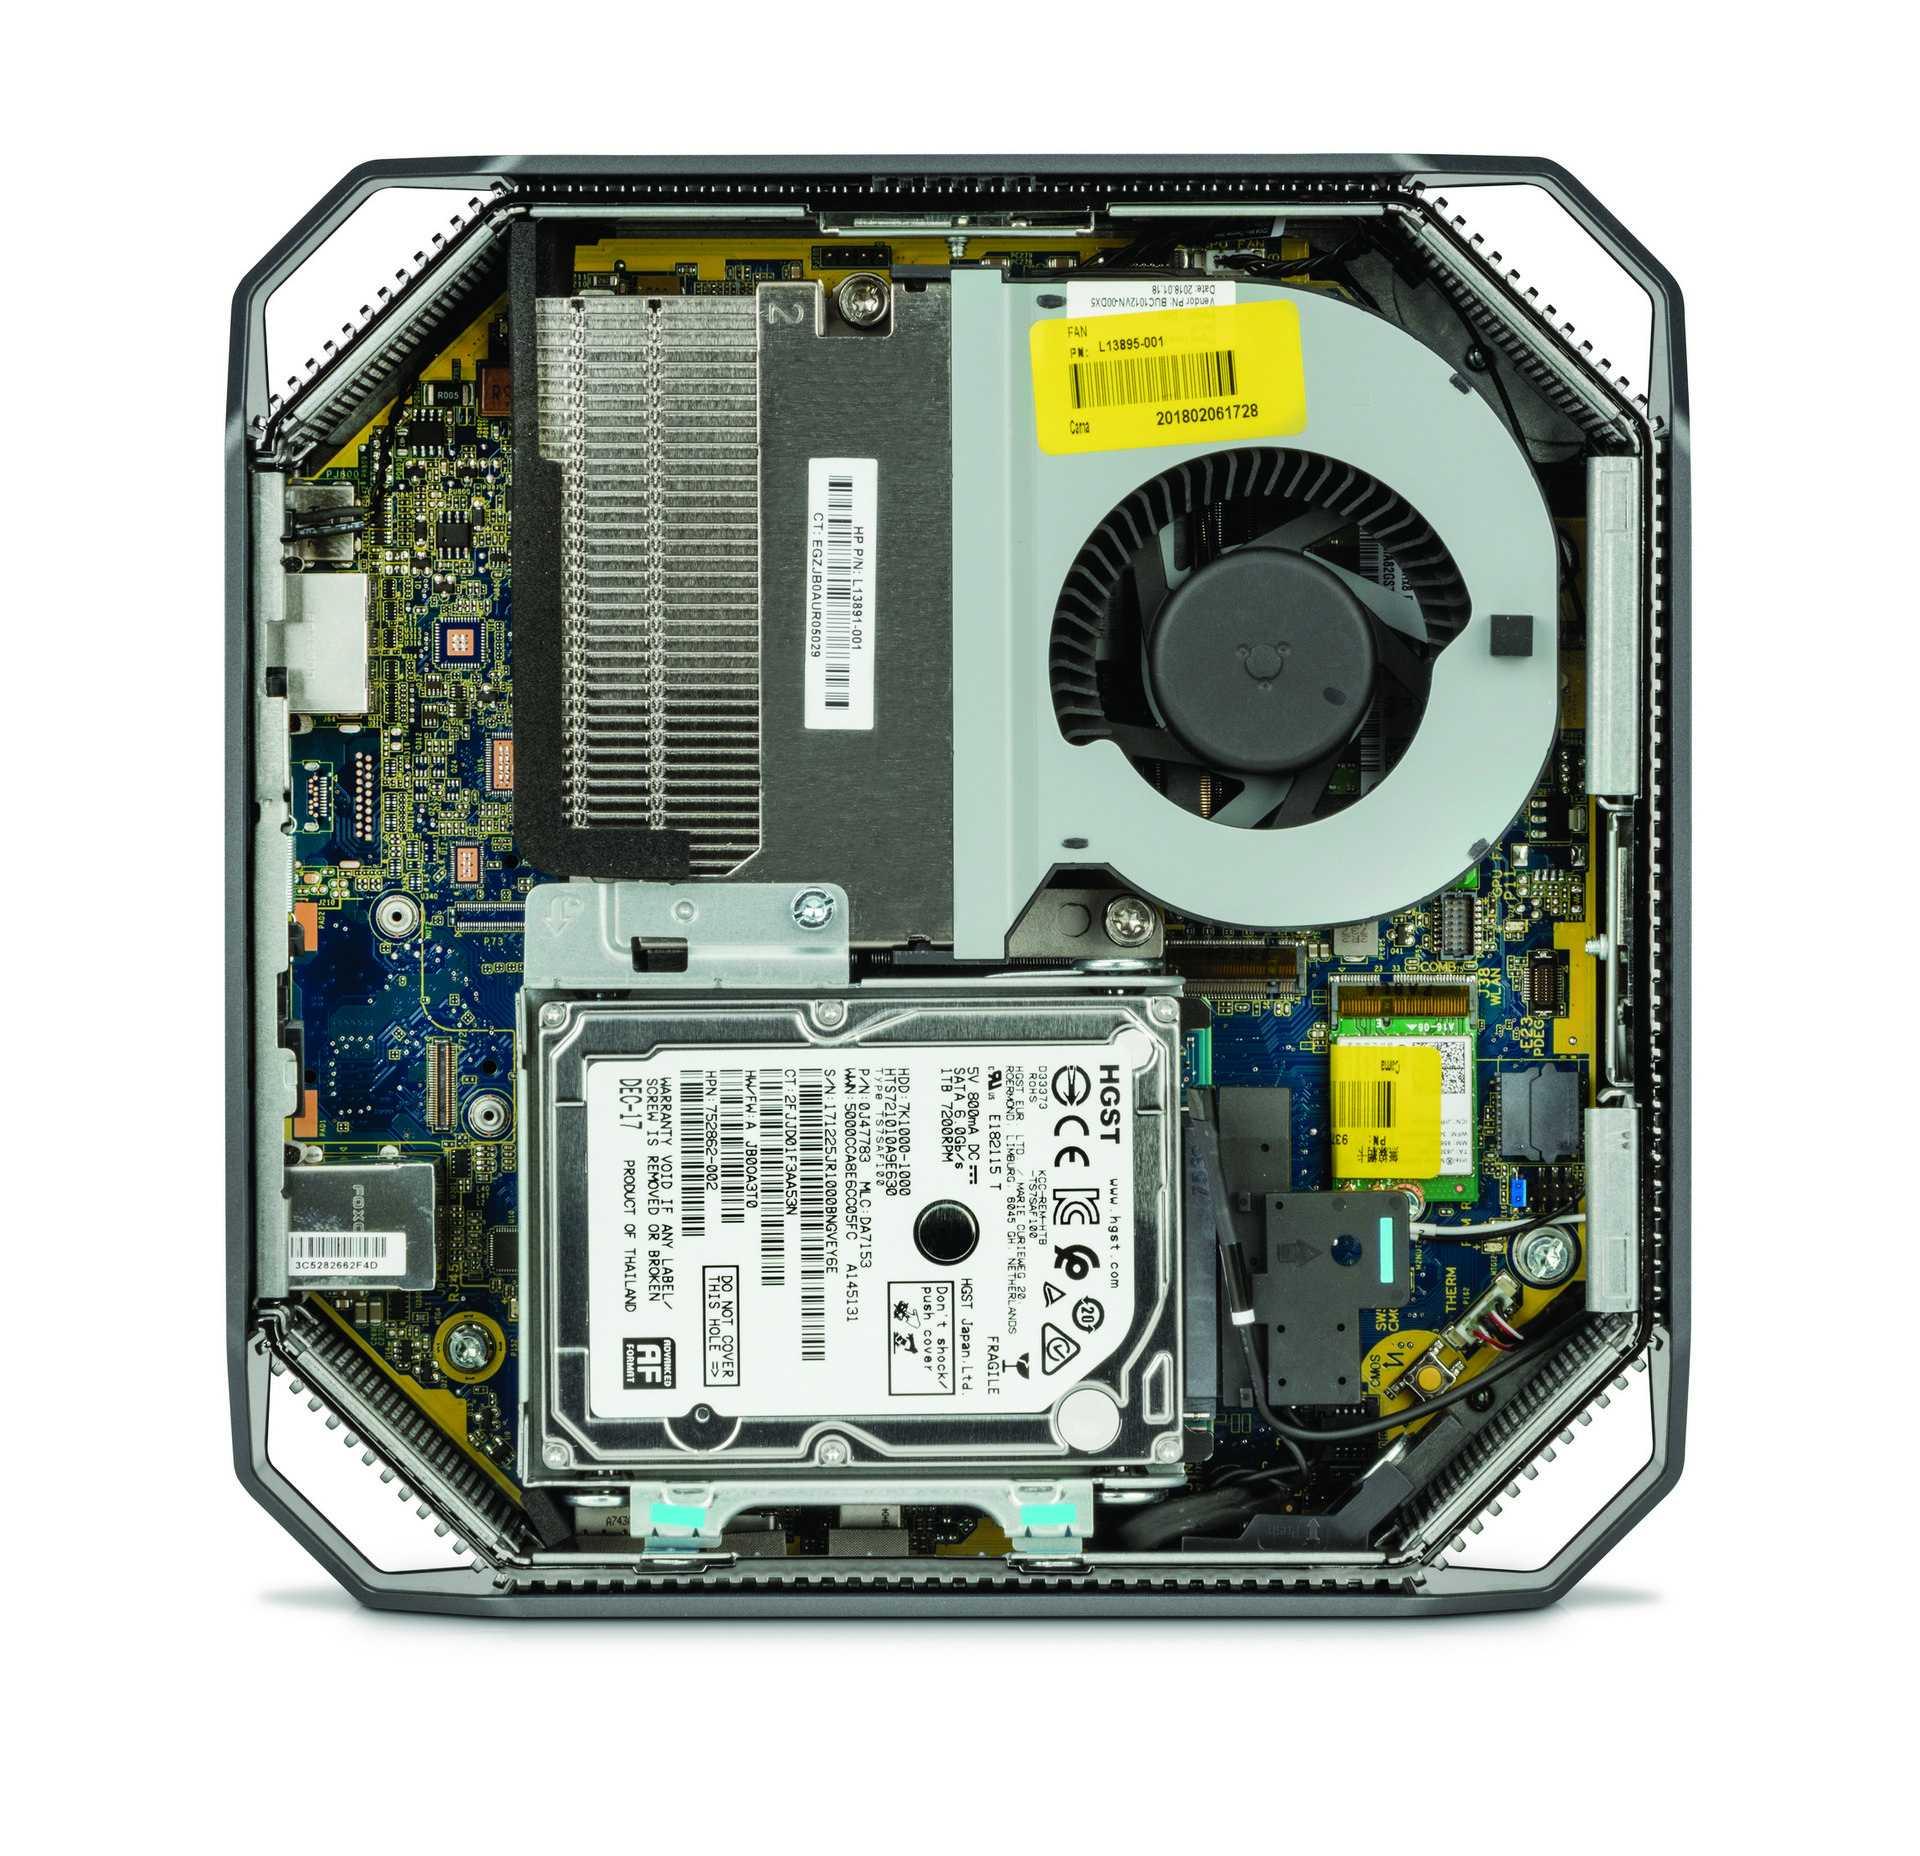 HP Z2 Mini G4 Innenleben